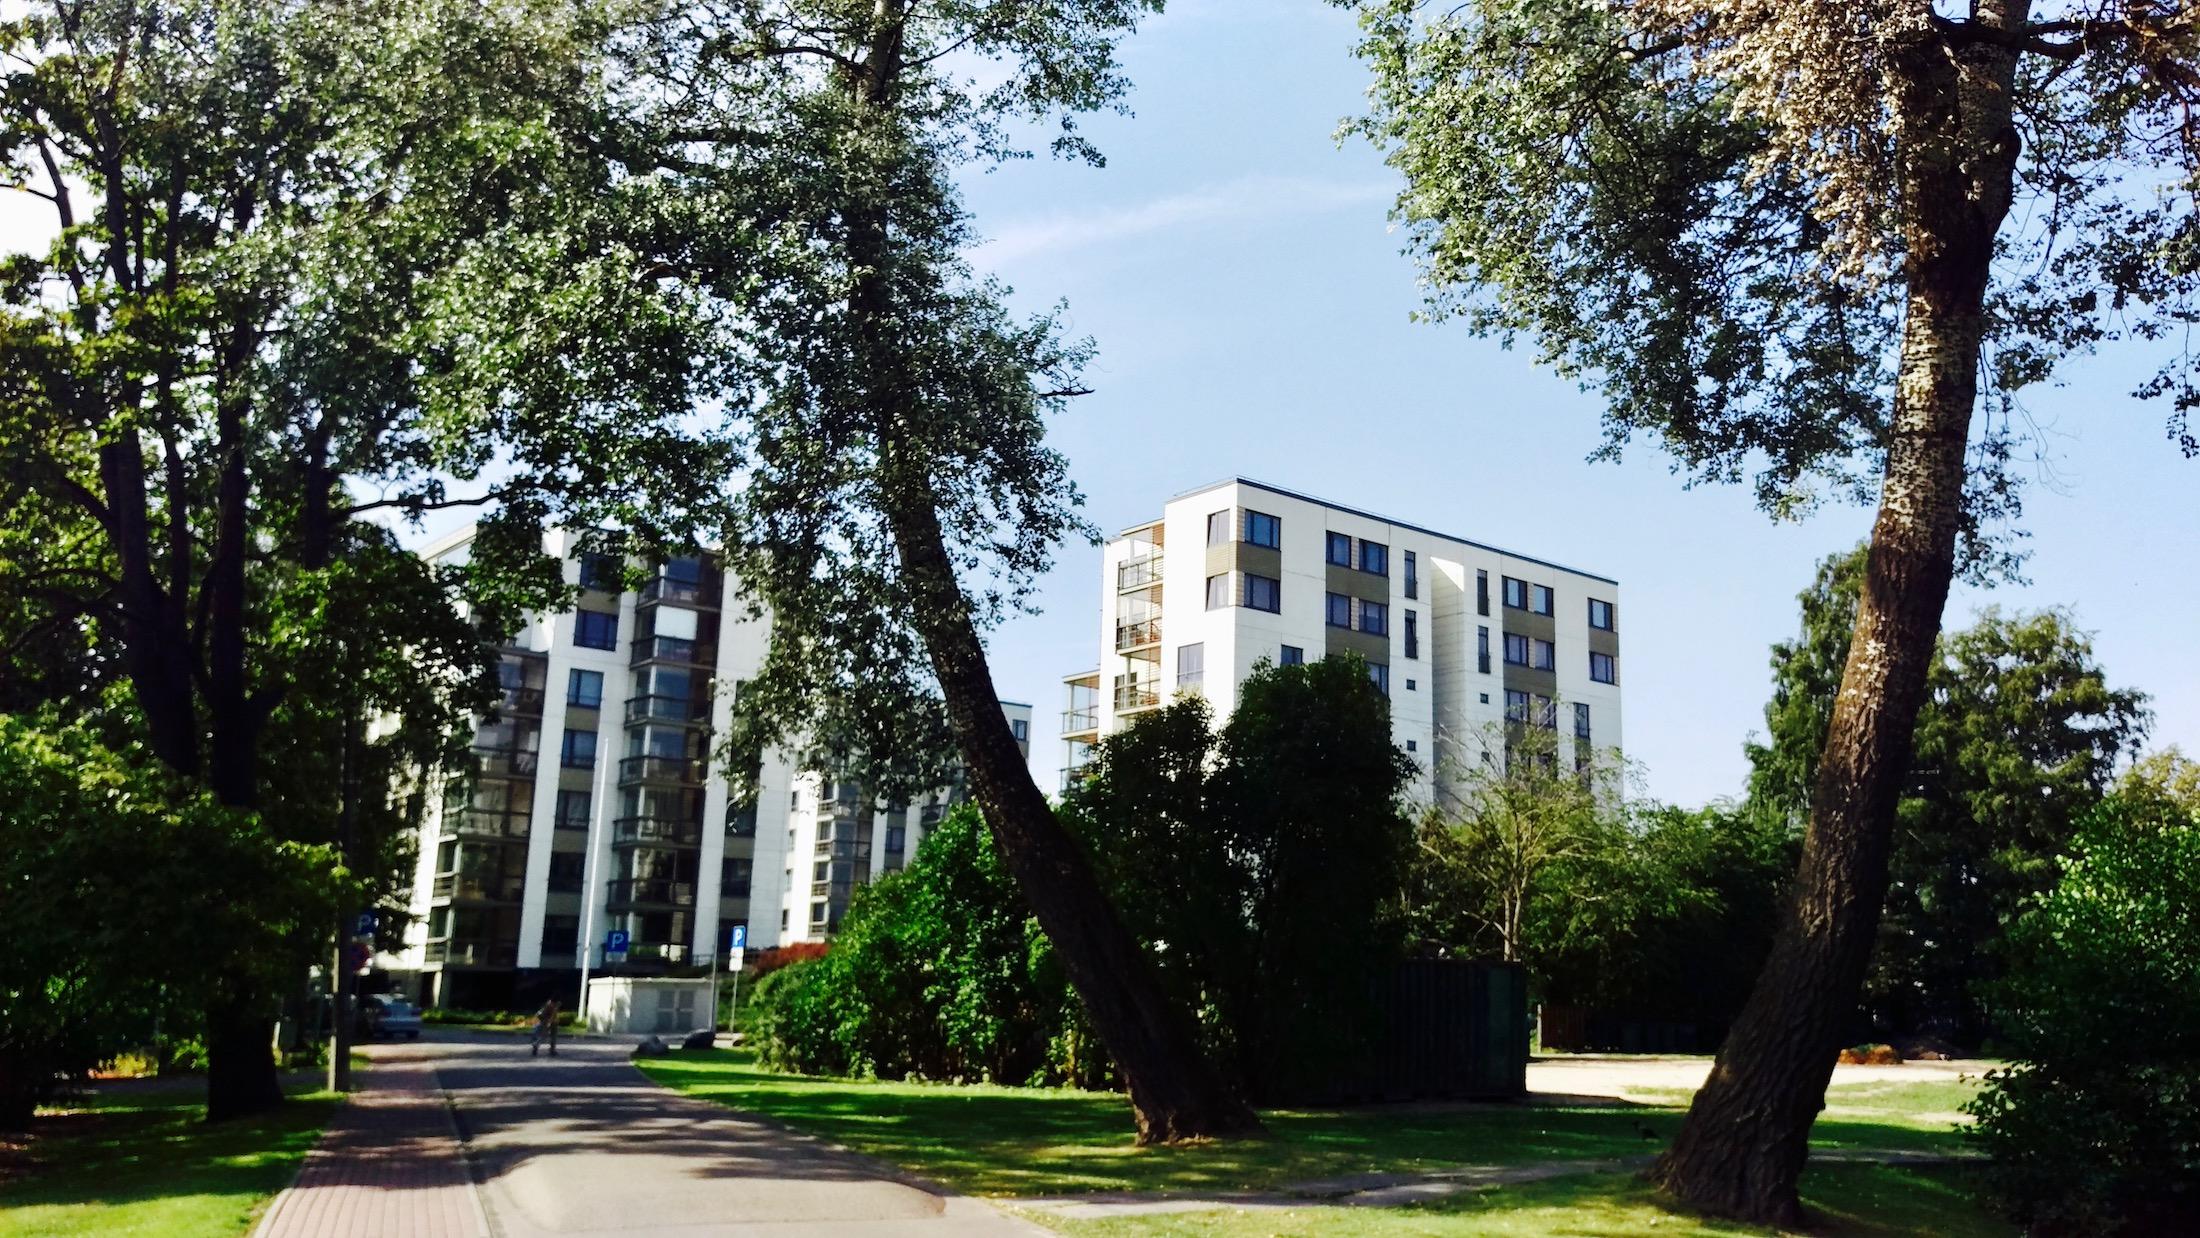 Viesturdārzda residential buildings